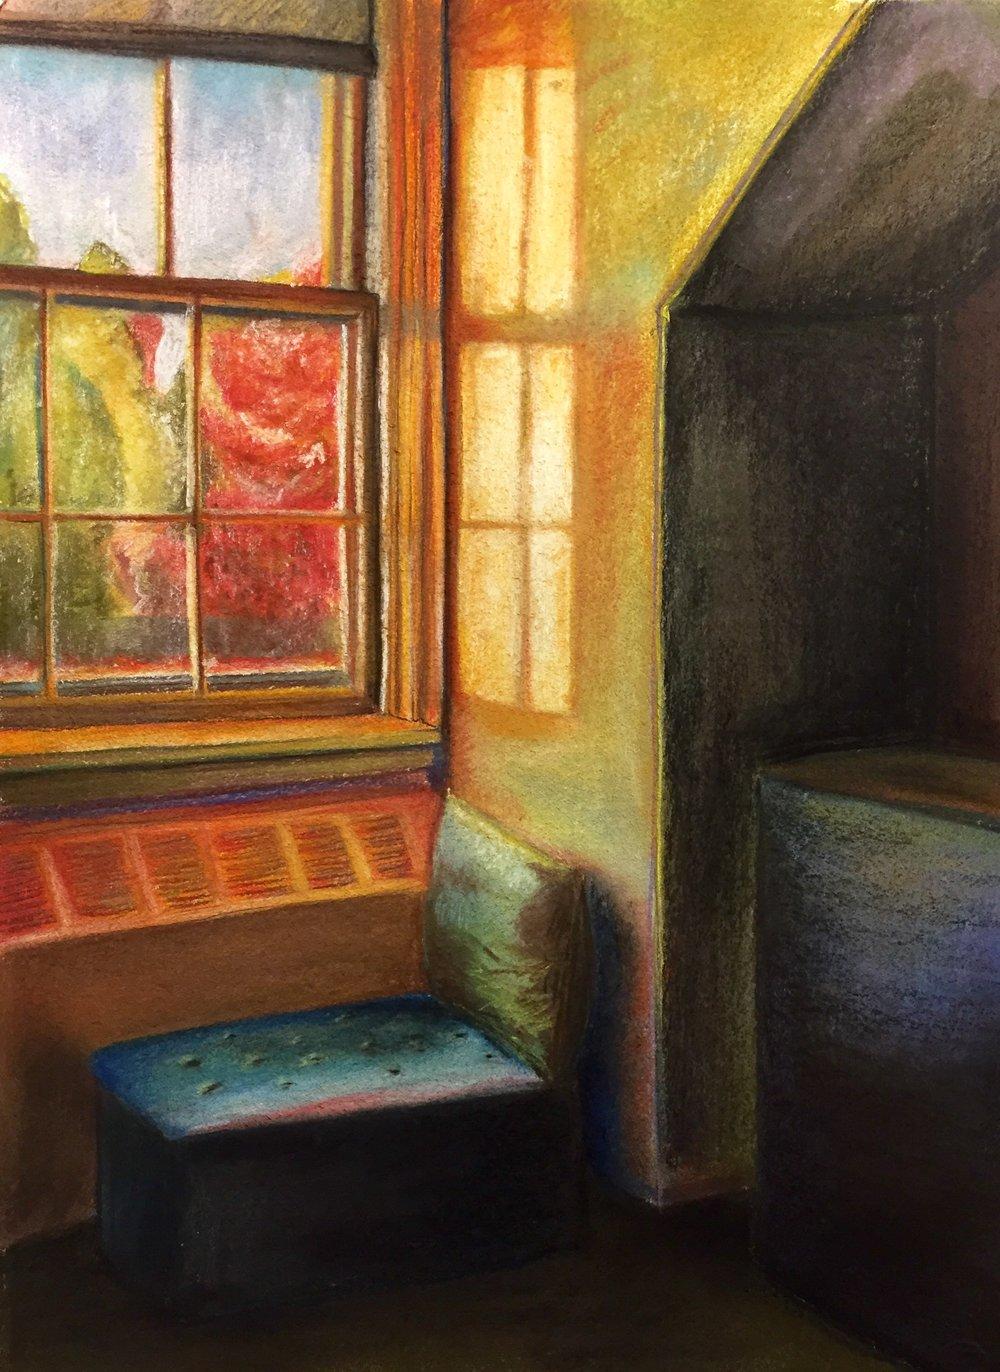 Subject: Light